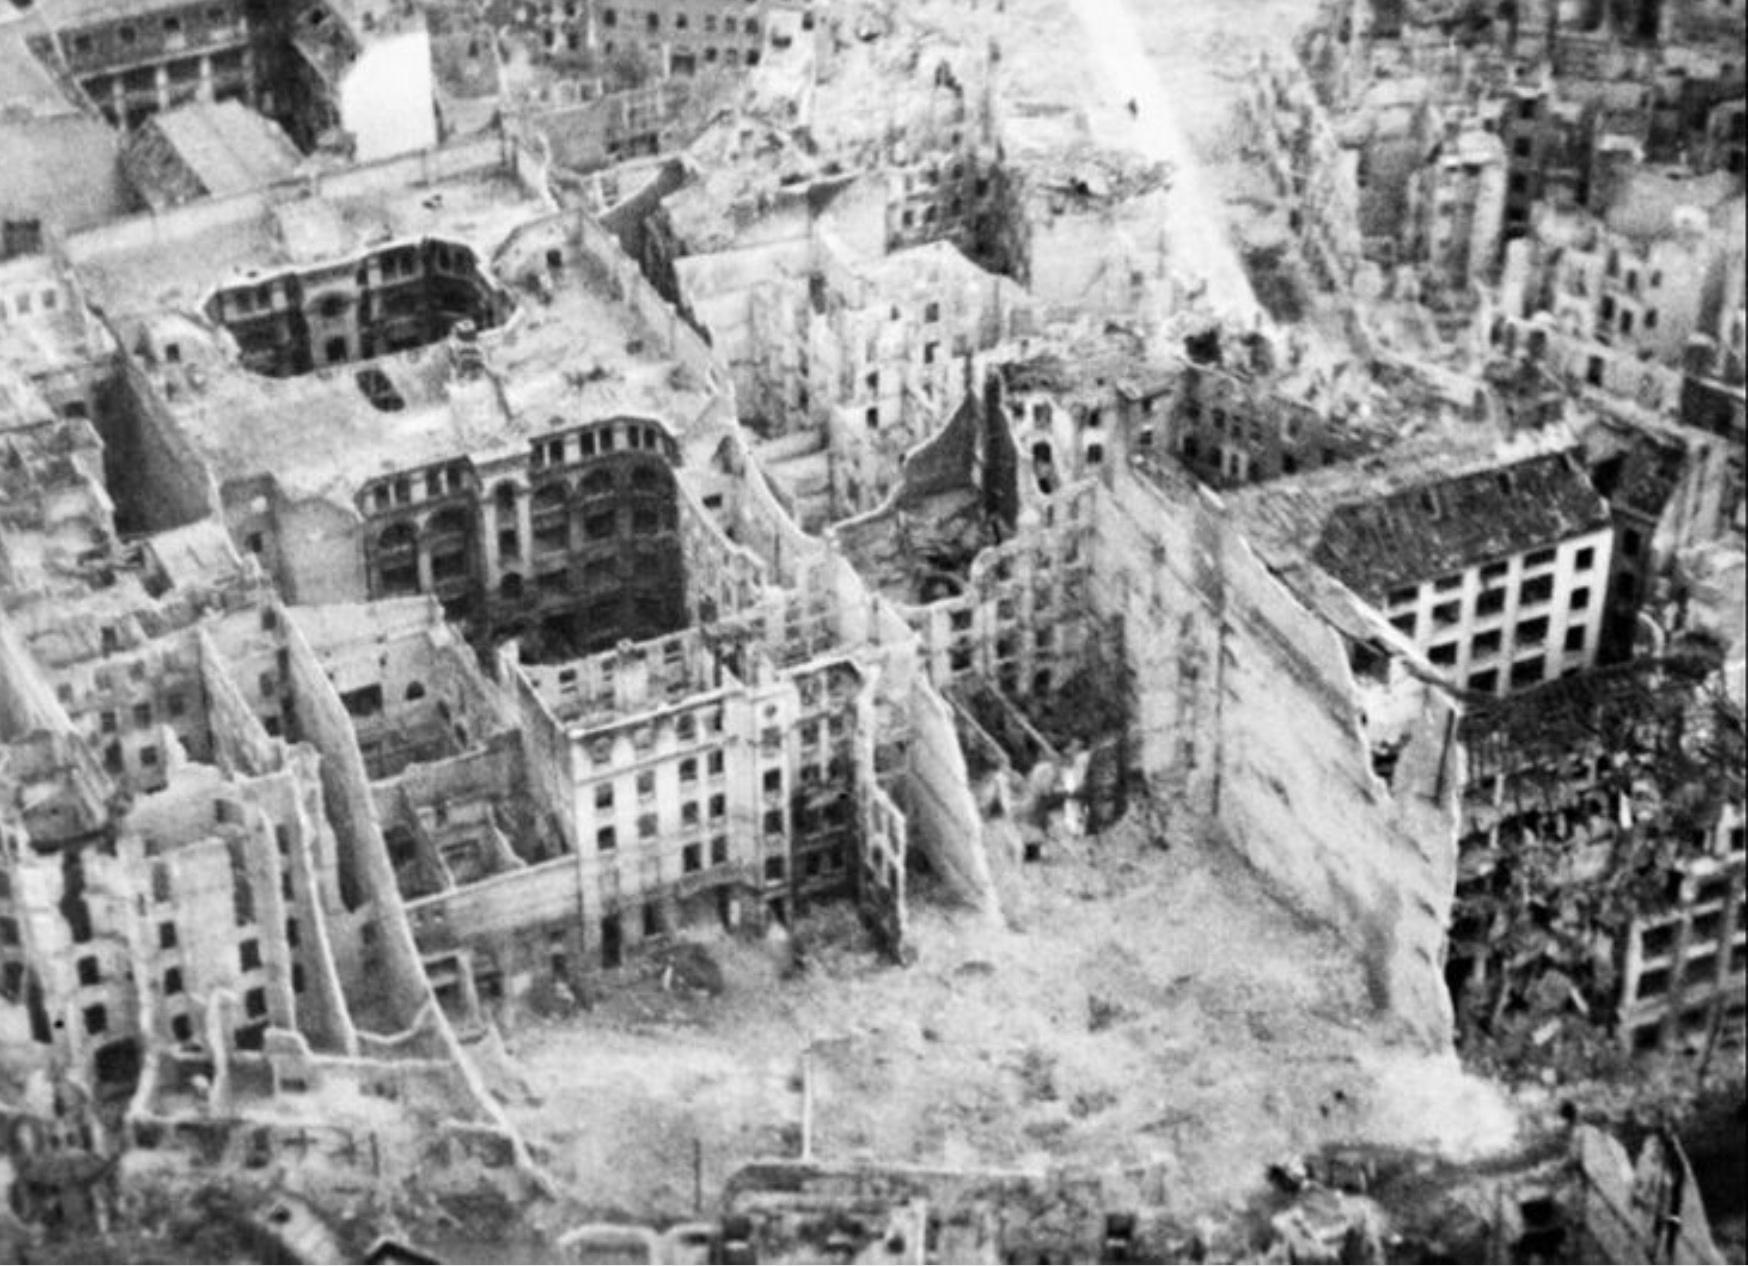 Ingrid Hempell Life in Postwar East Germany (revisited)